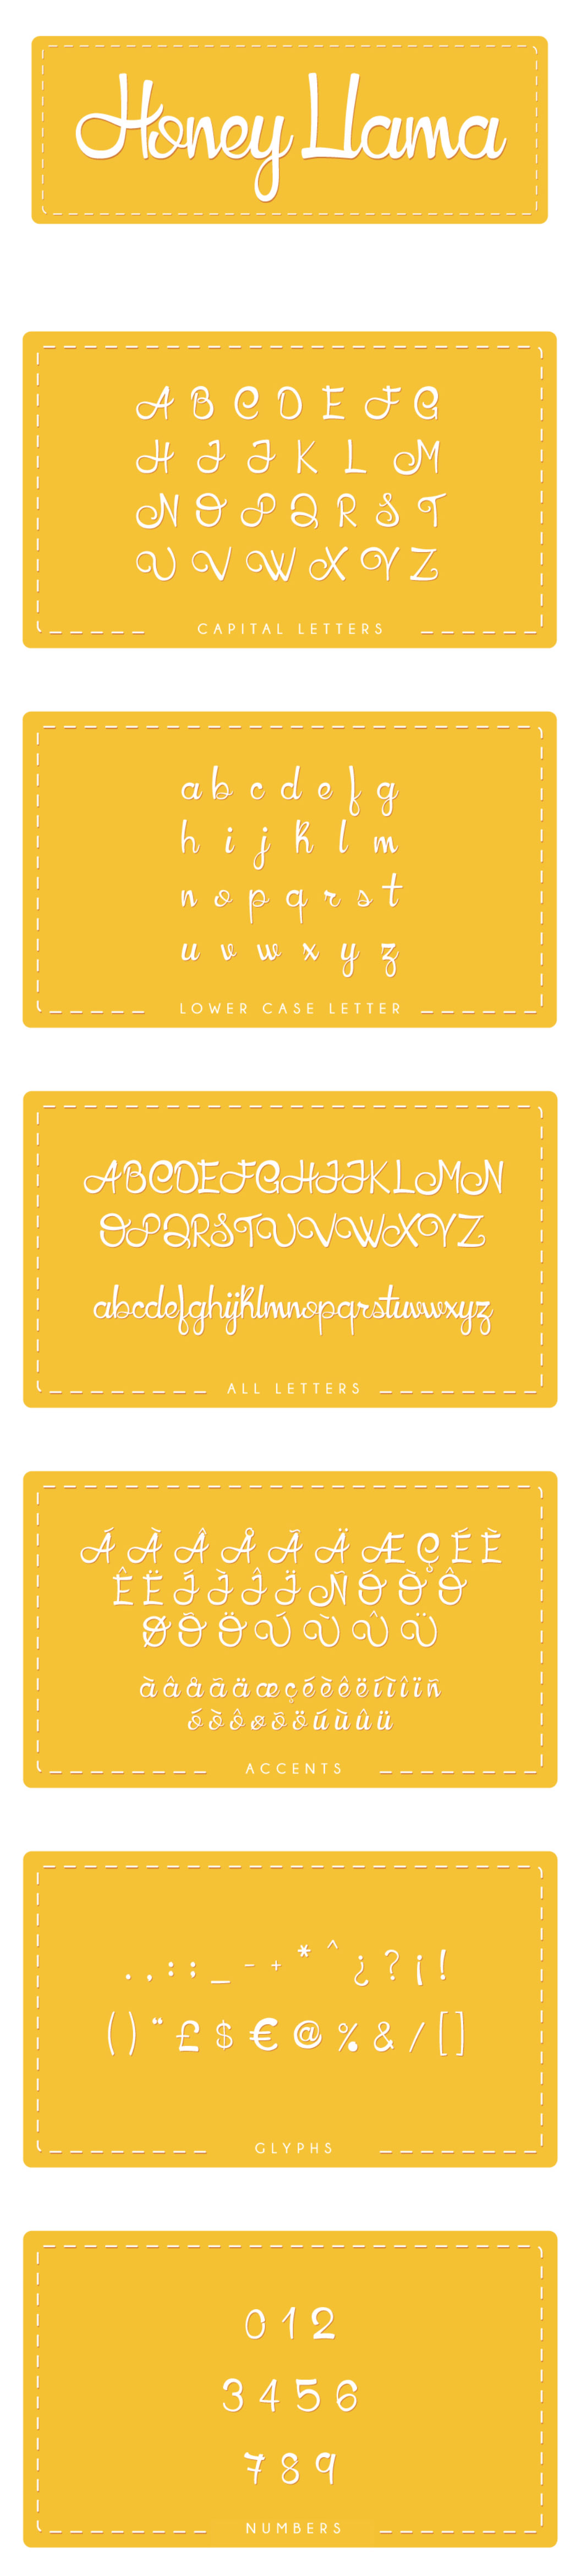 HoneyLlama Font